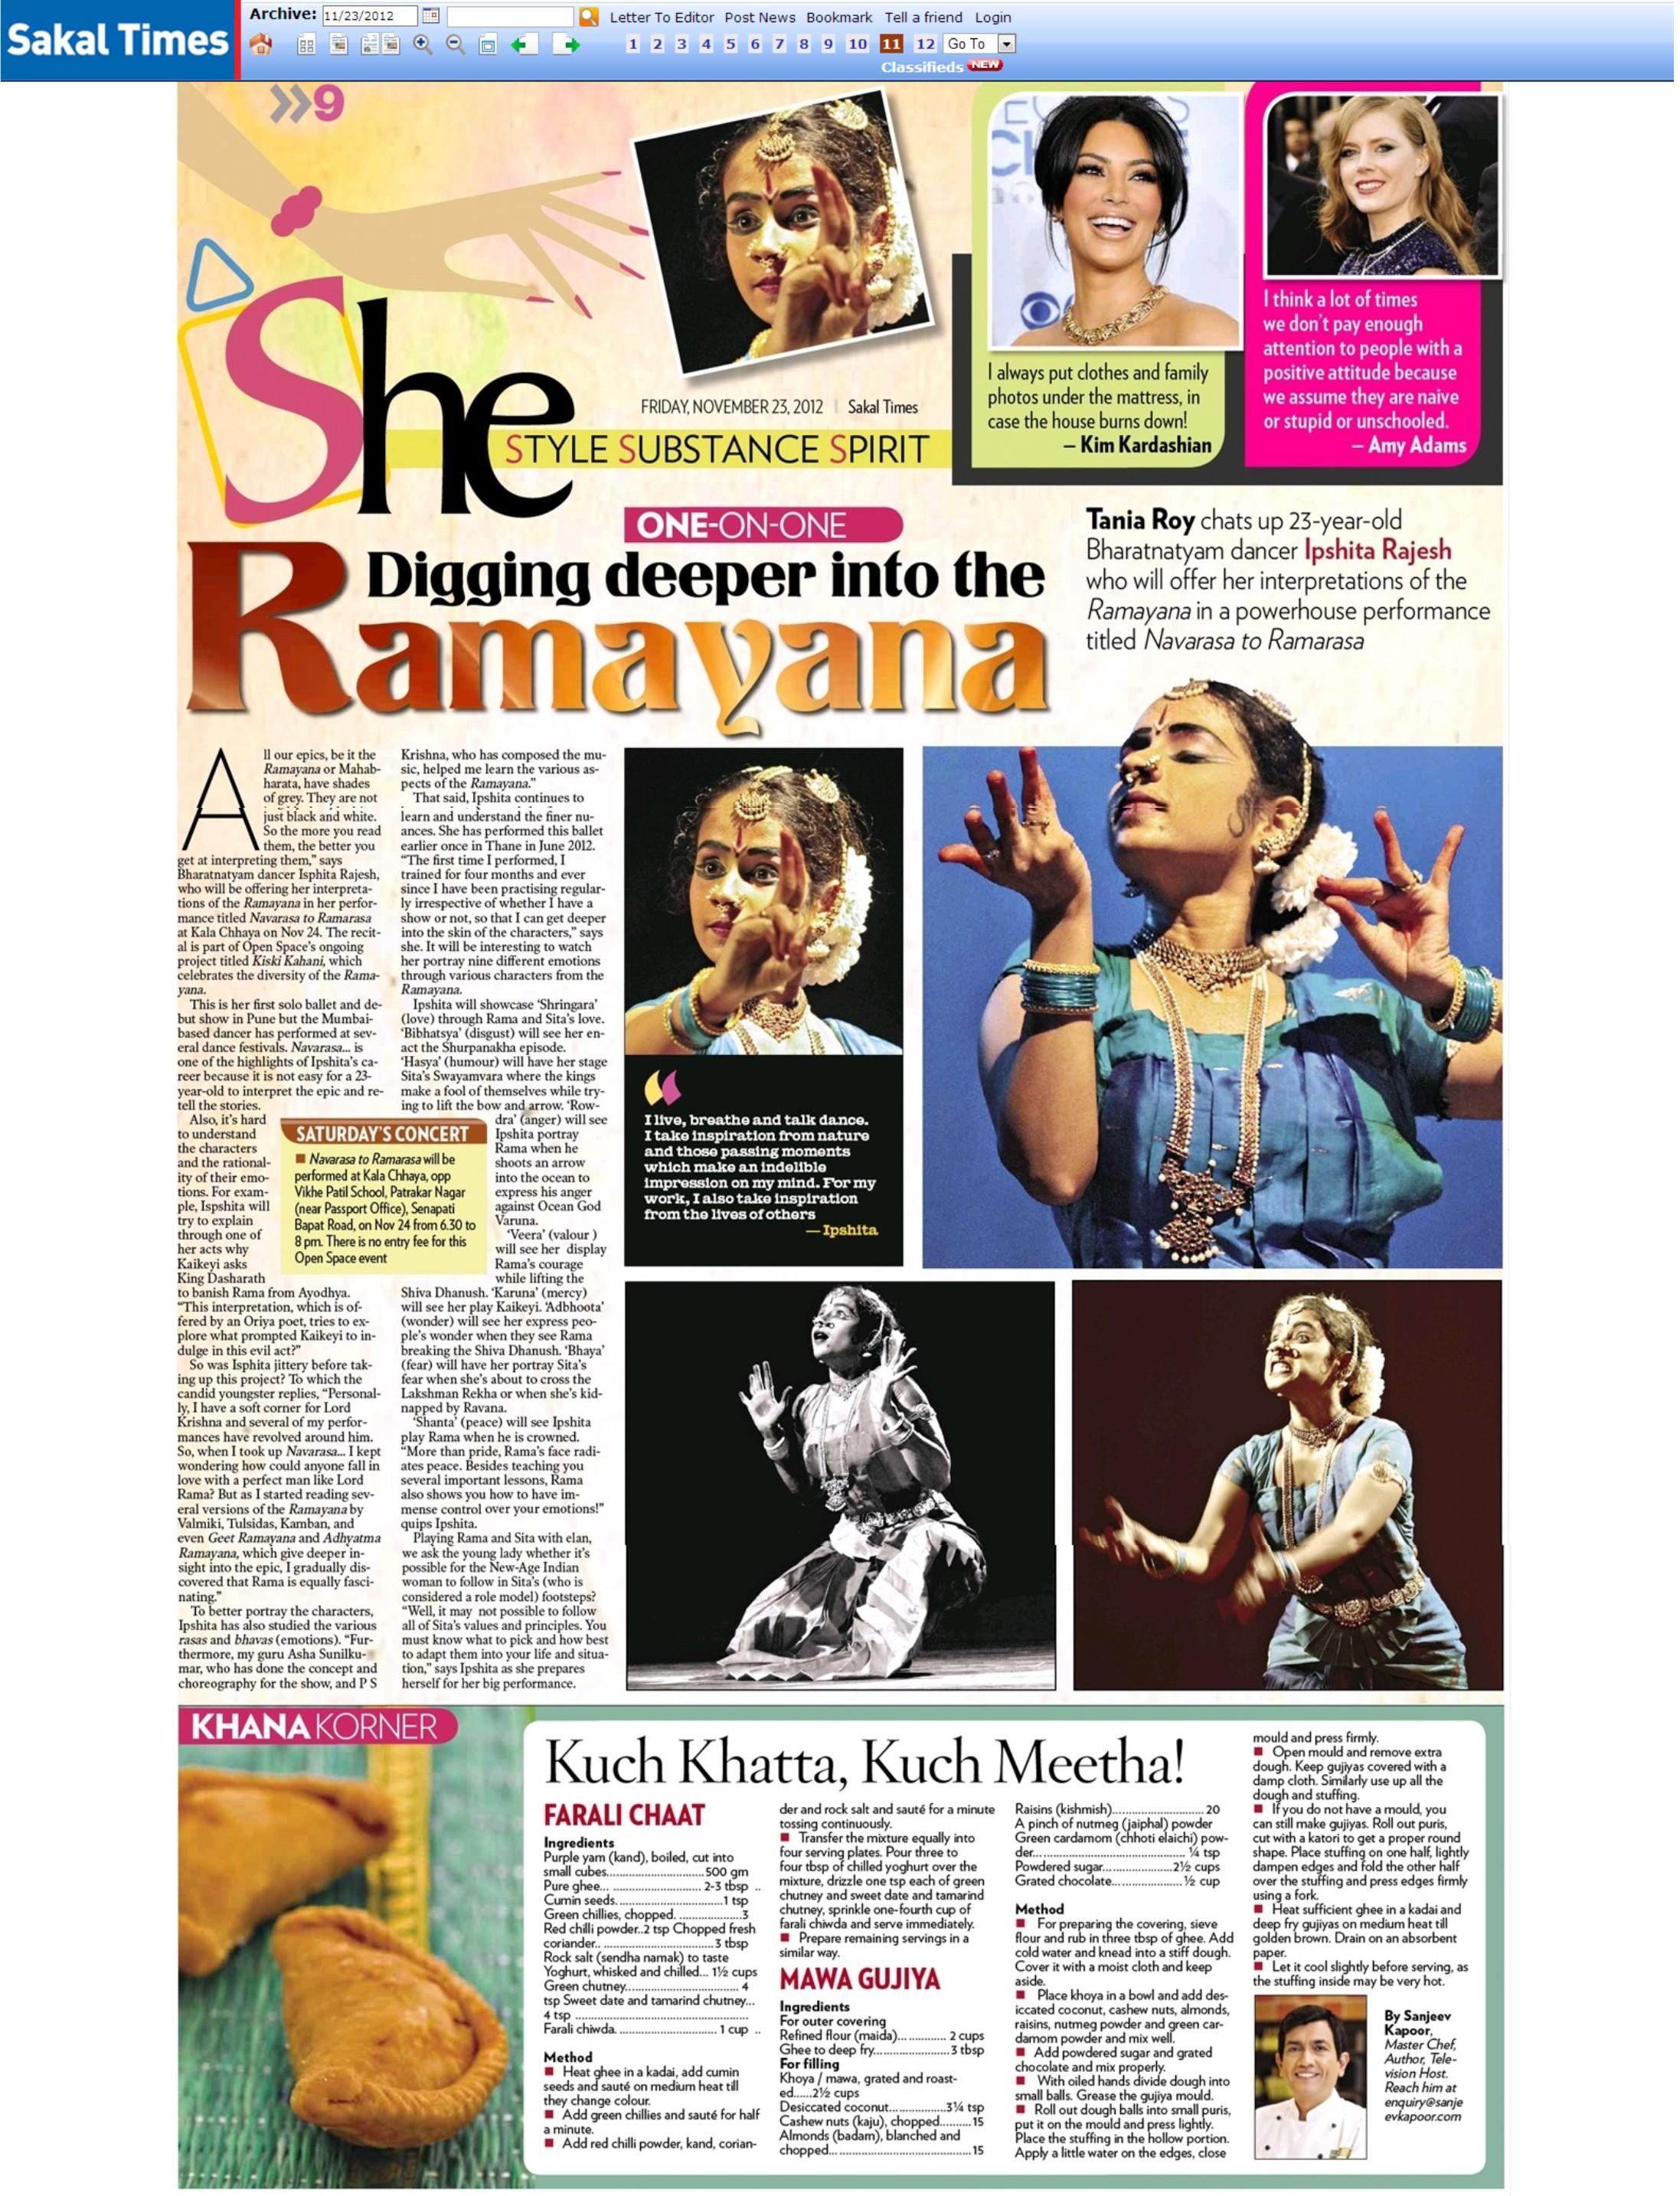 Sakaal Times - Nov 23, 2012.jpg